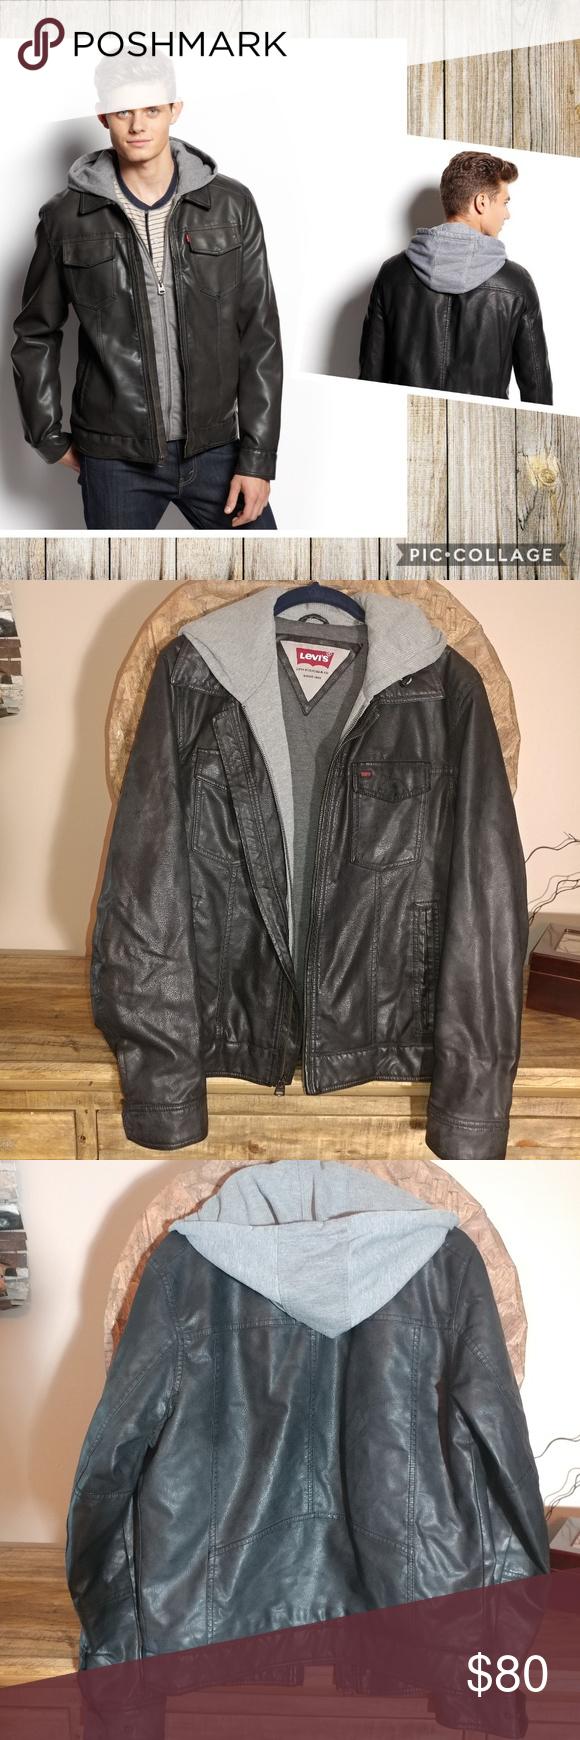 Levi S Black Faux Leather Jacket With Hoodie Liner Leather Jacket Black Faux Leather Jacket Hoodie Jacket [ 1740 x 580 Pixel ]